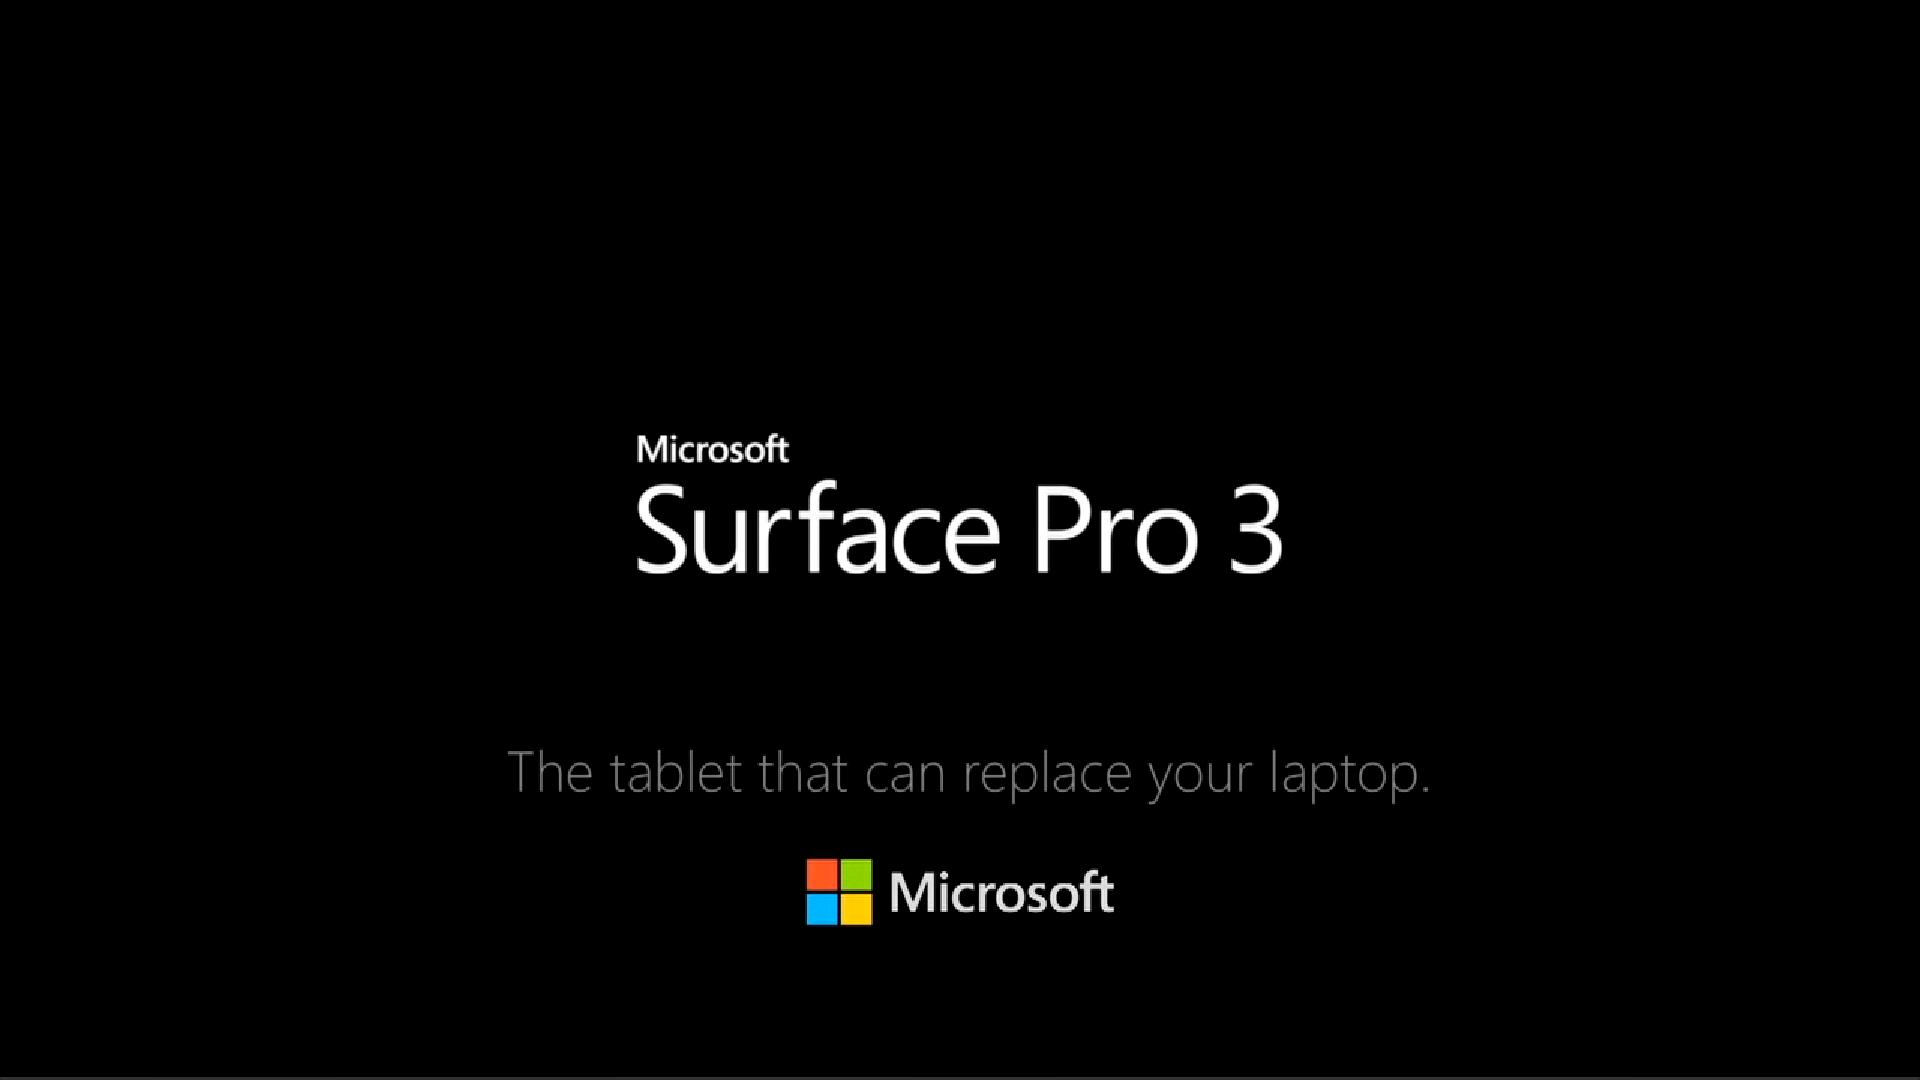 Surface Pro 3 Hd Wallpapers Wallpapersafari